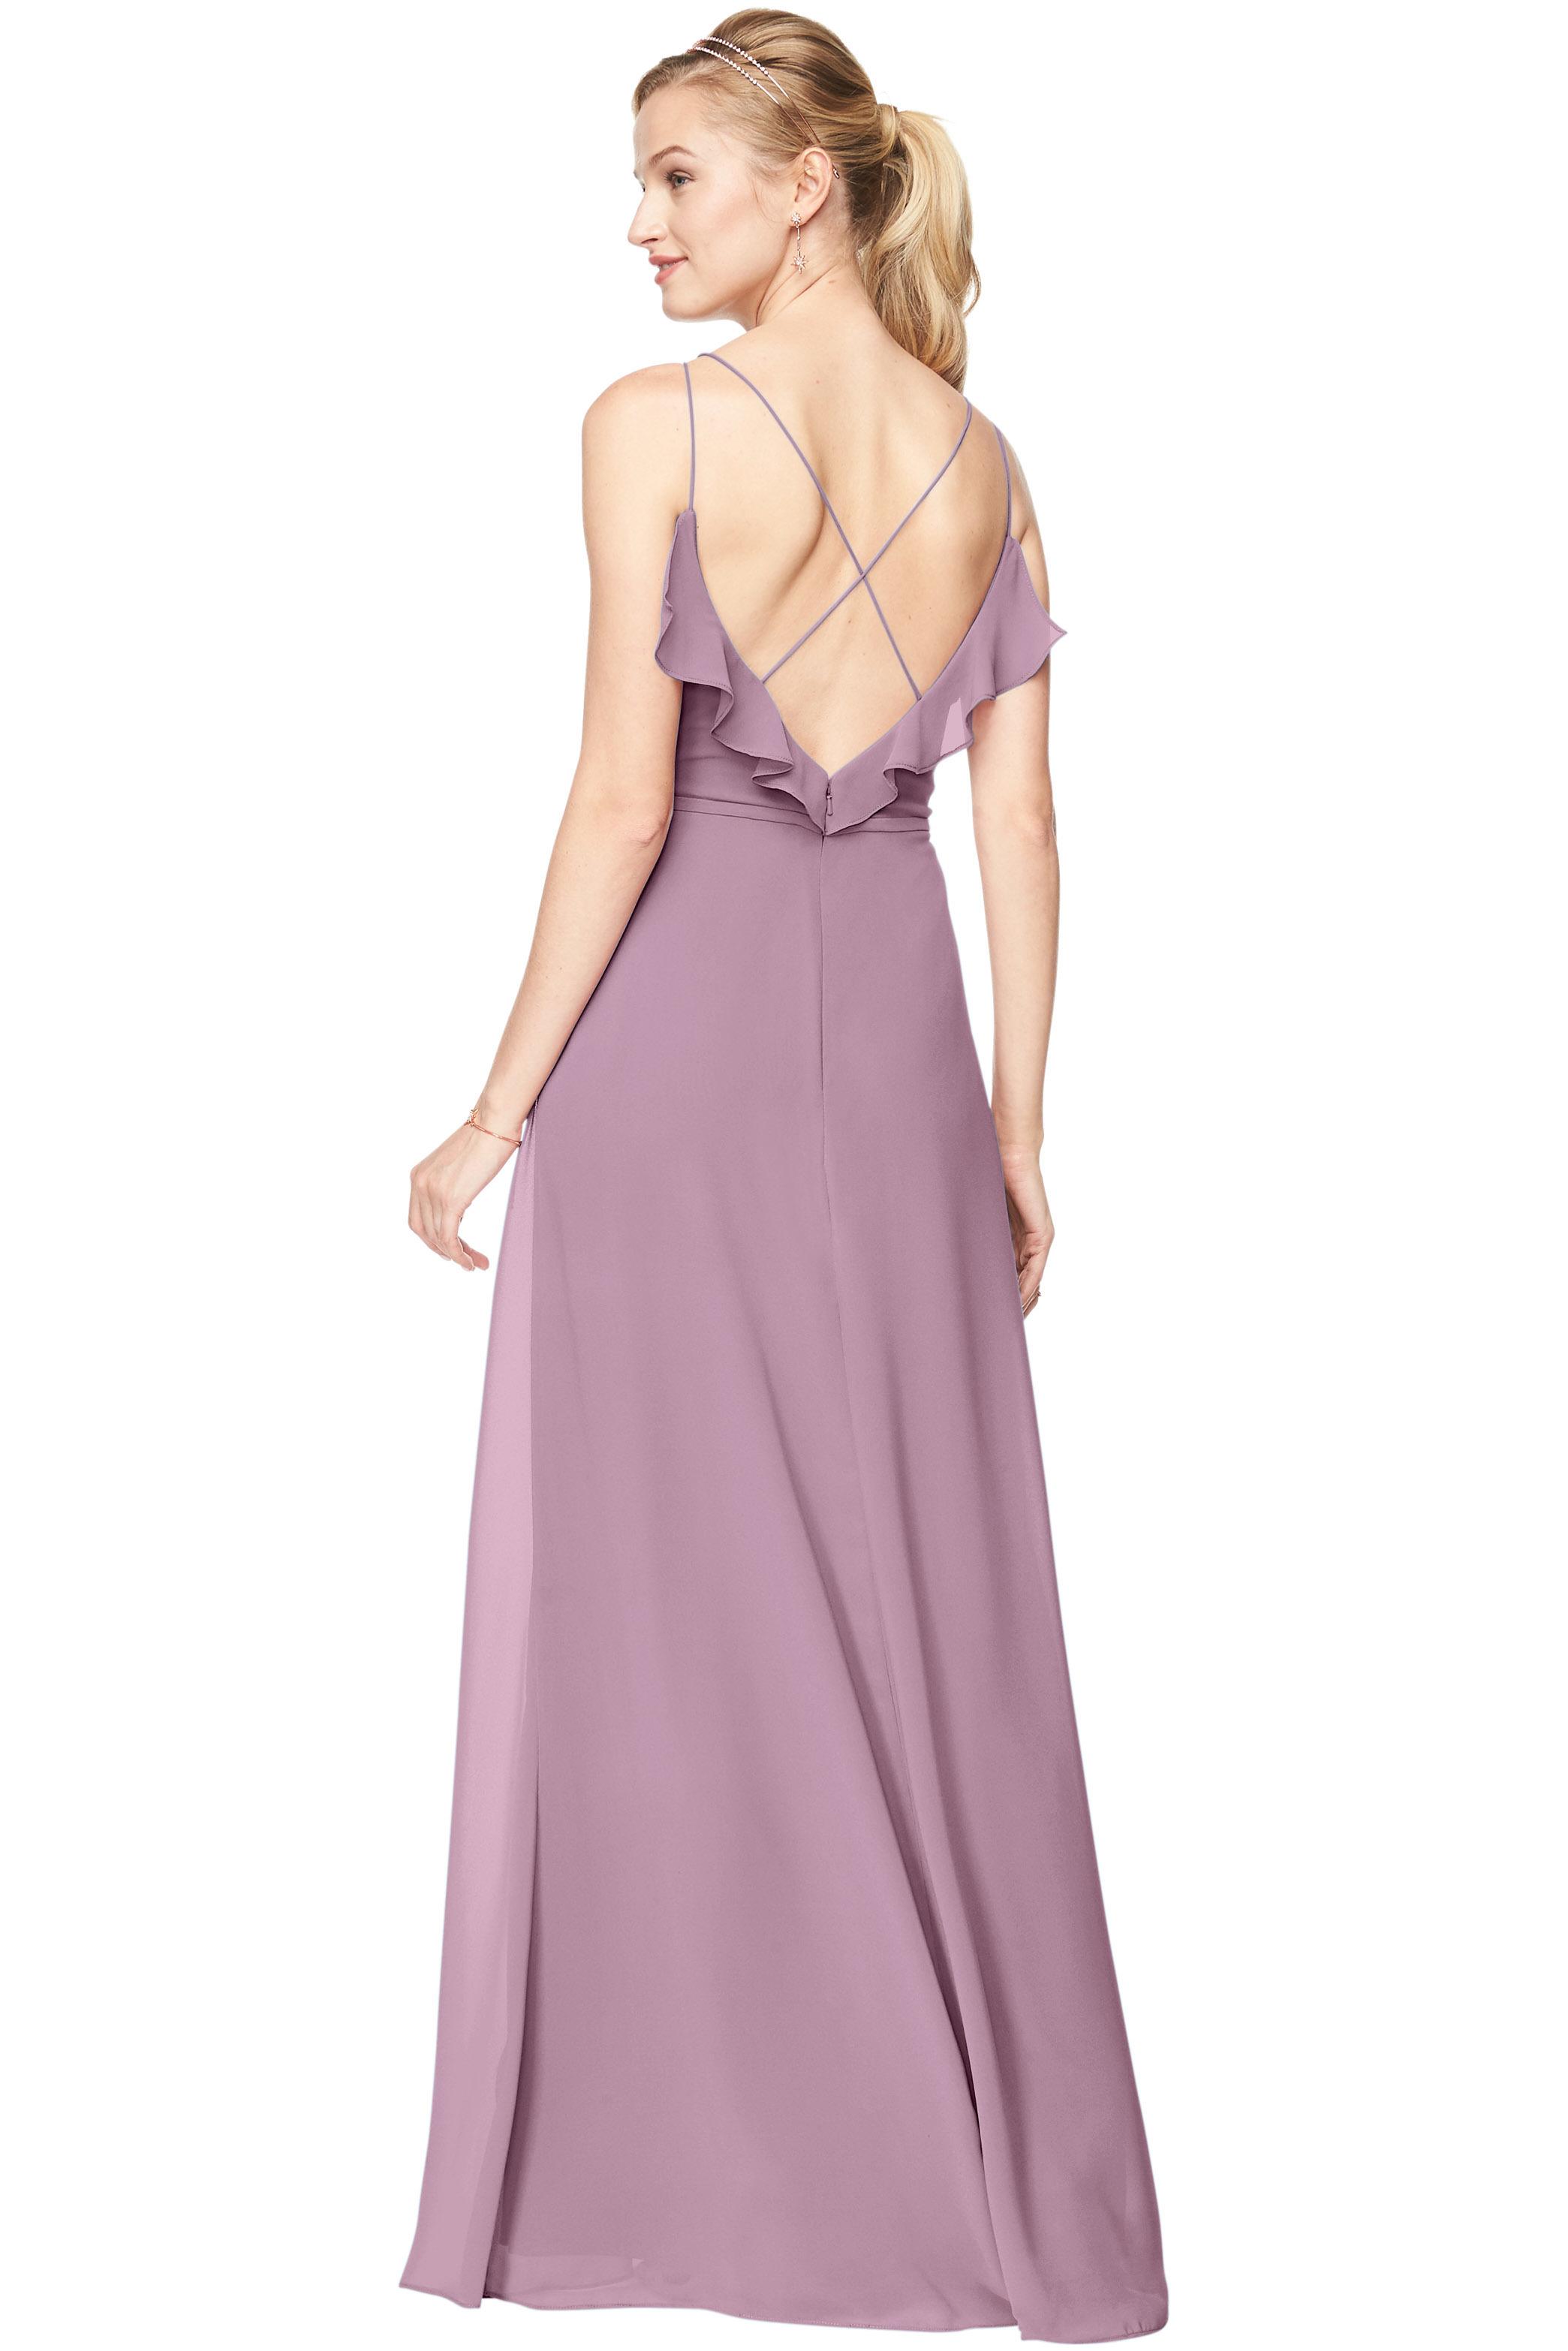 Bill Levkoff WISTERIA Chiffon V-Neck A-line gown, $198.00 Back